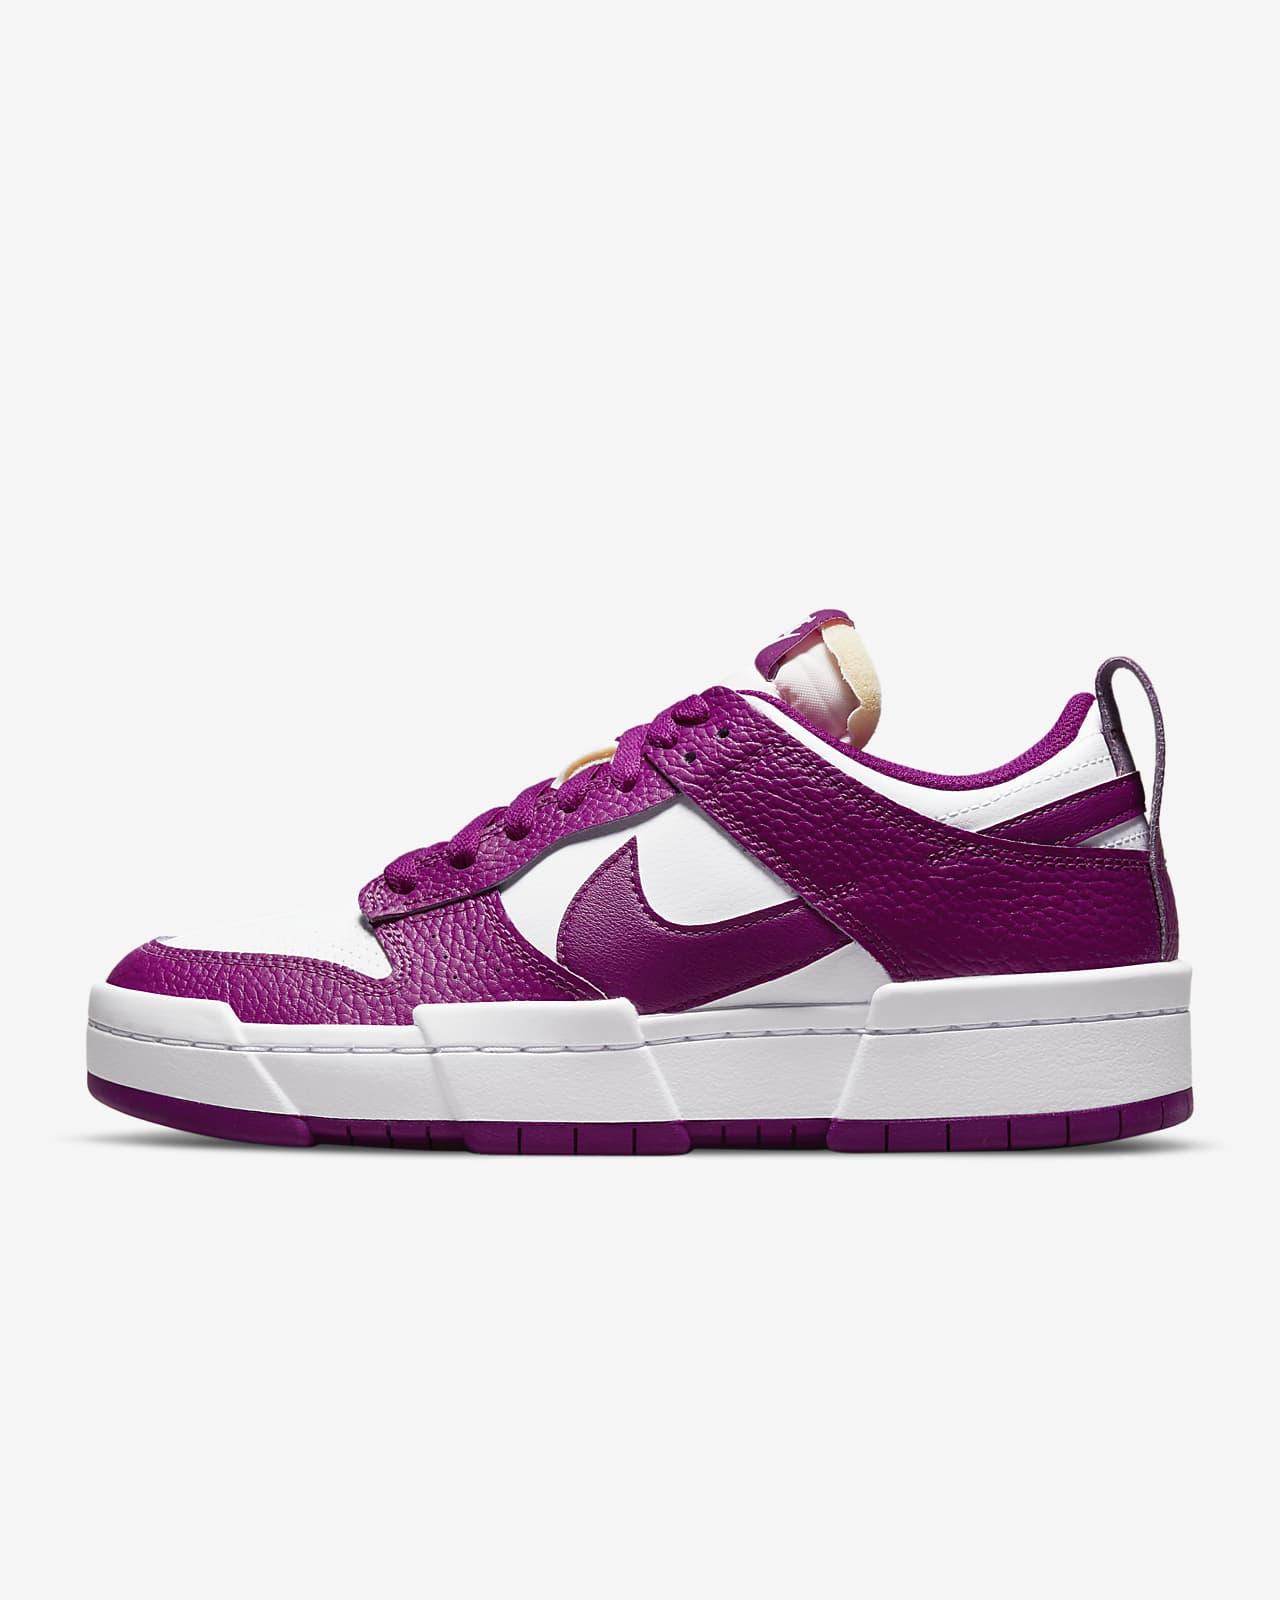 Nike Dunk Disrupt Women's Shoes